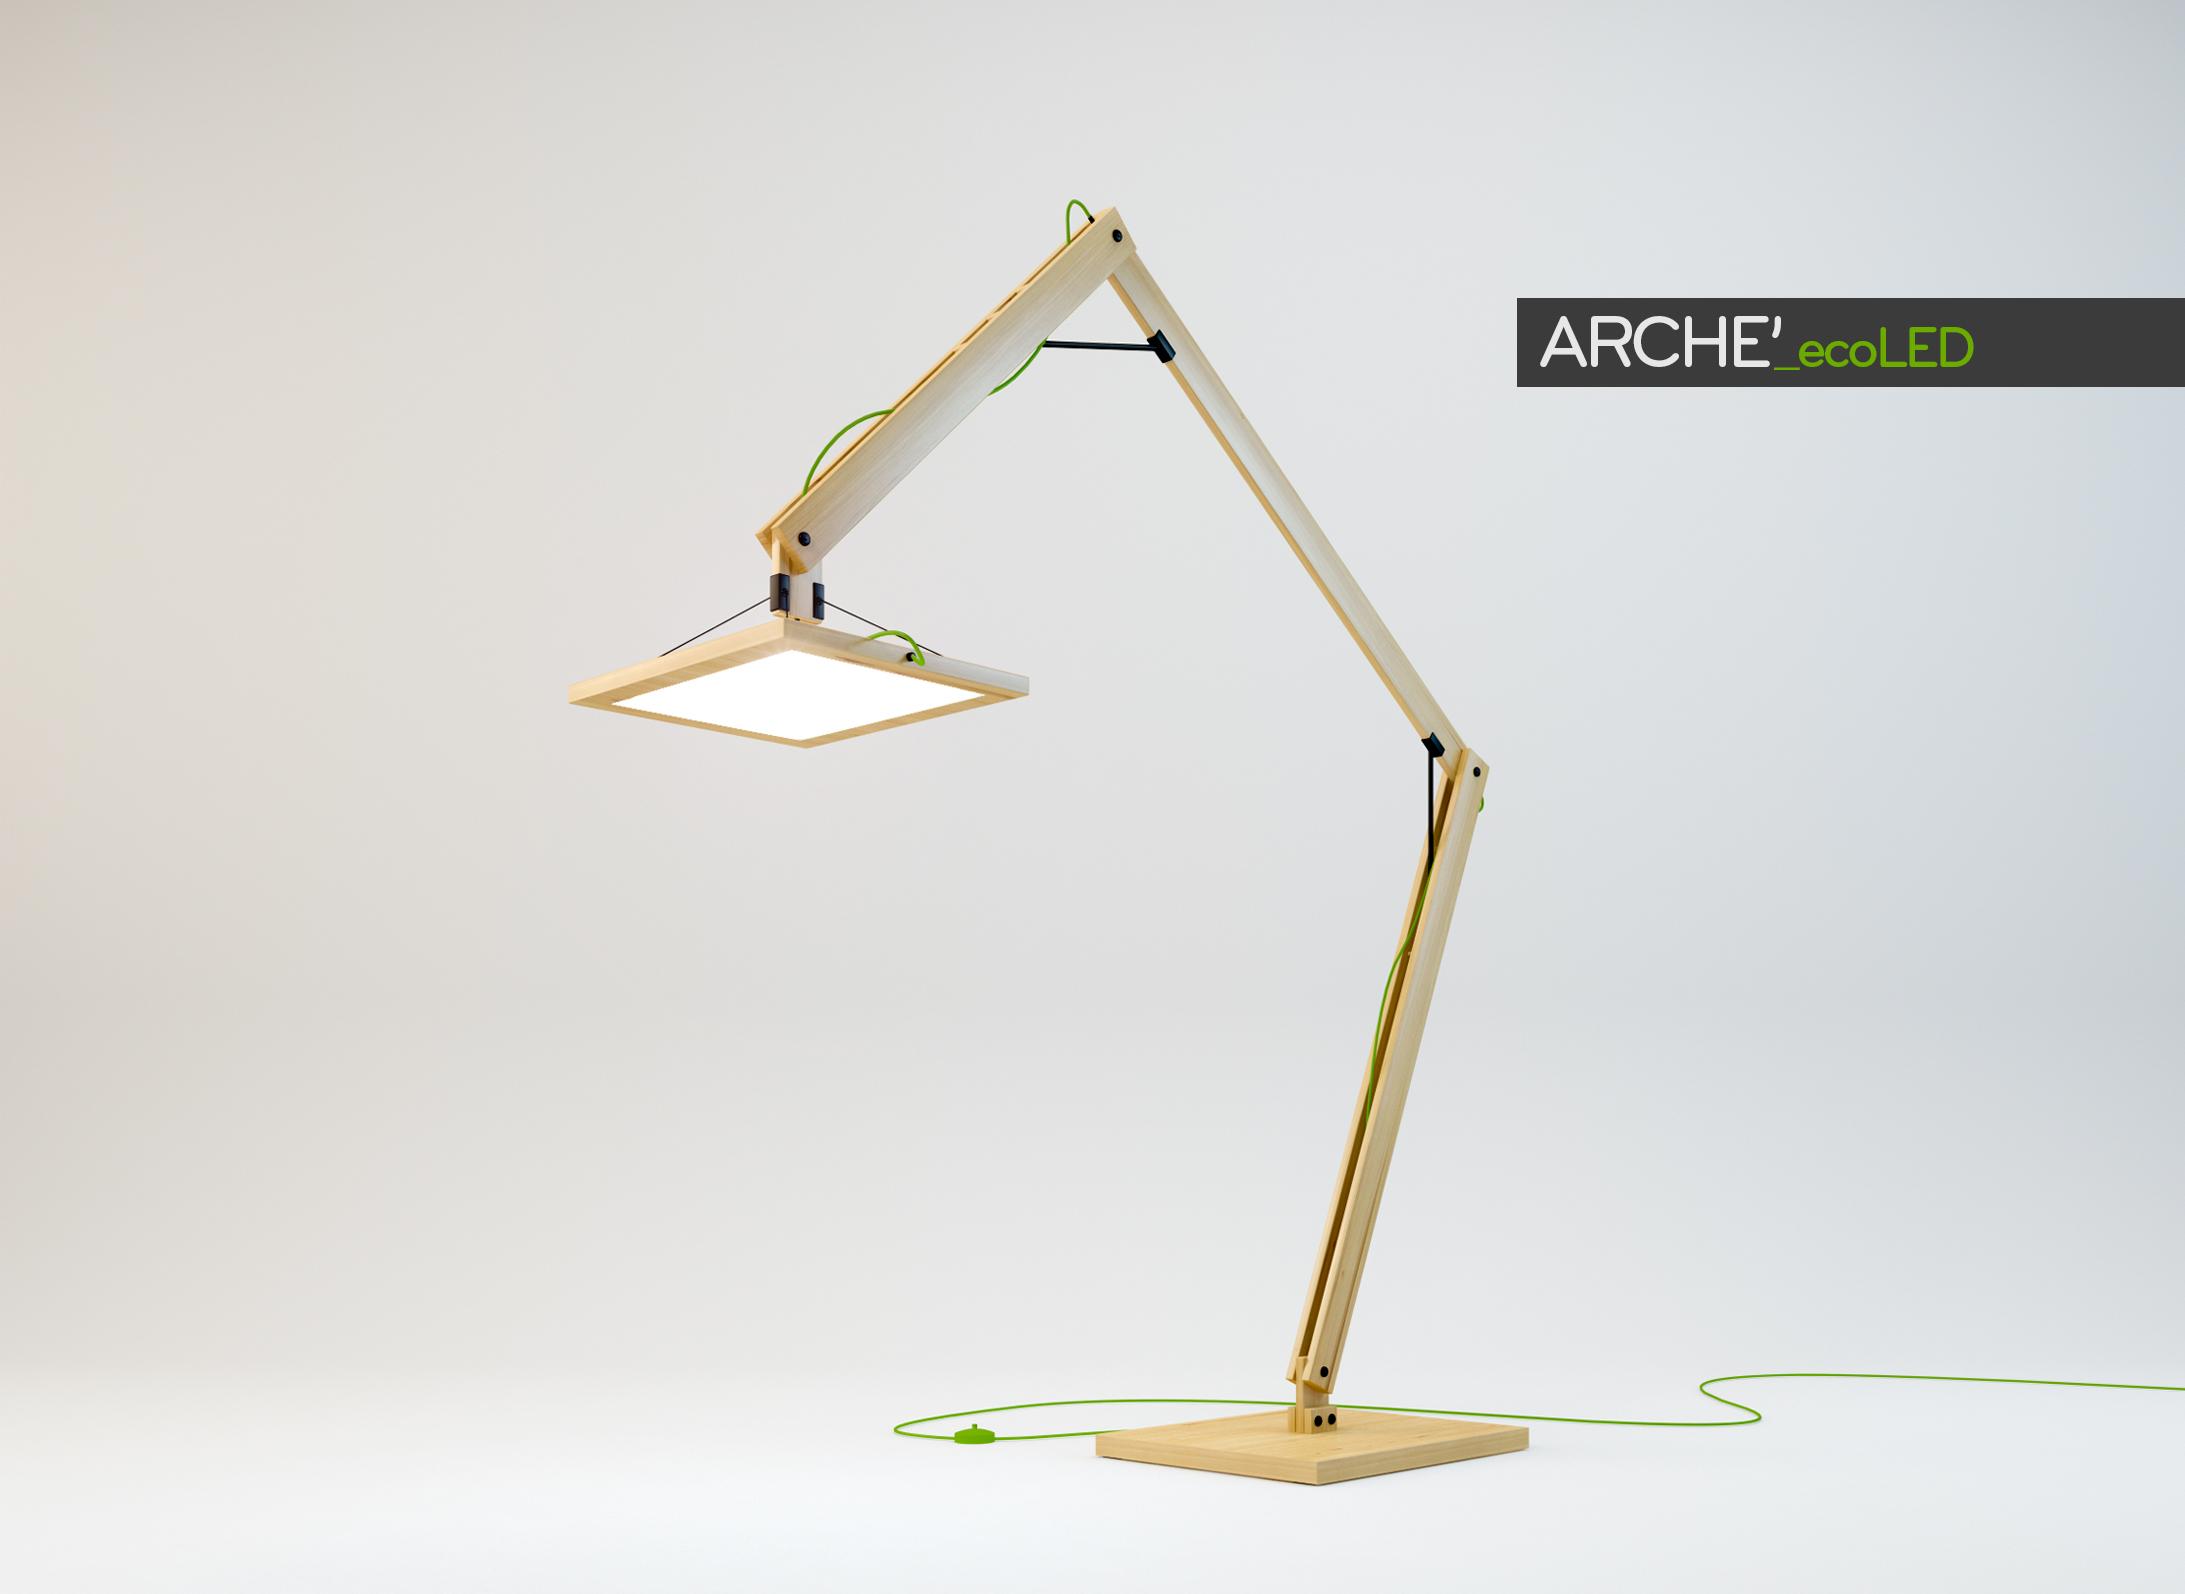 Archè_Fronte.jpg